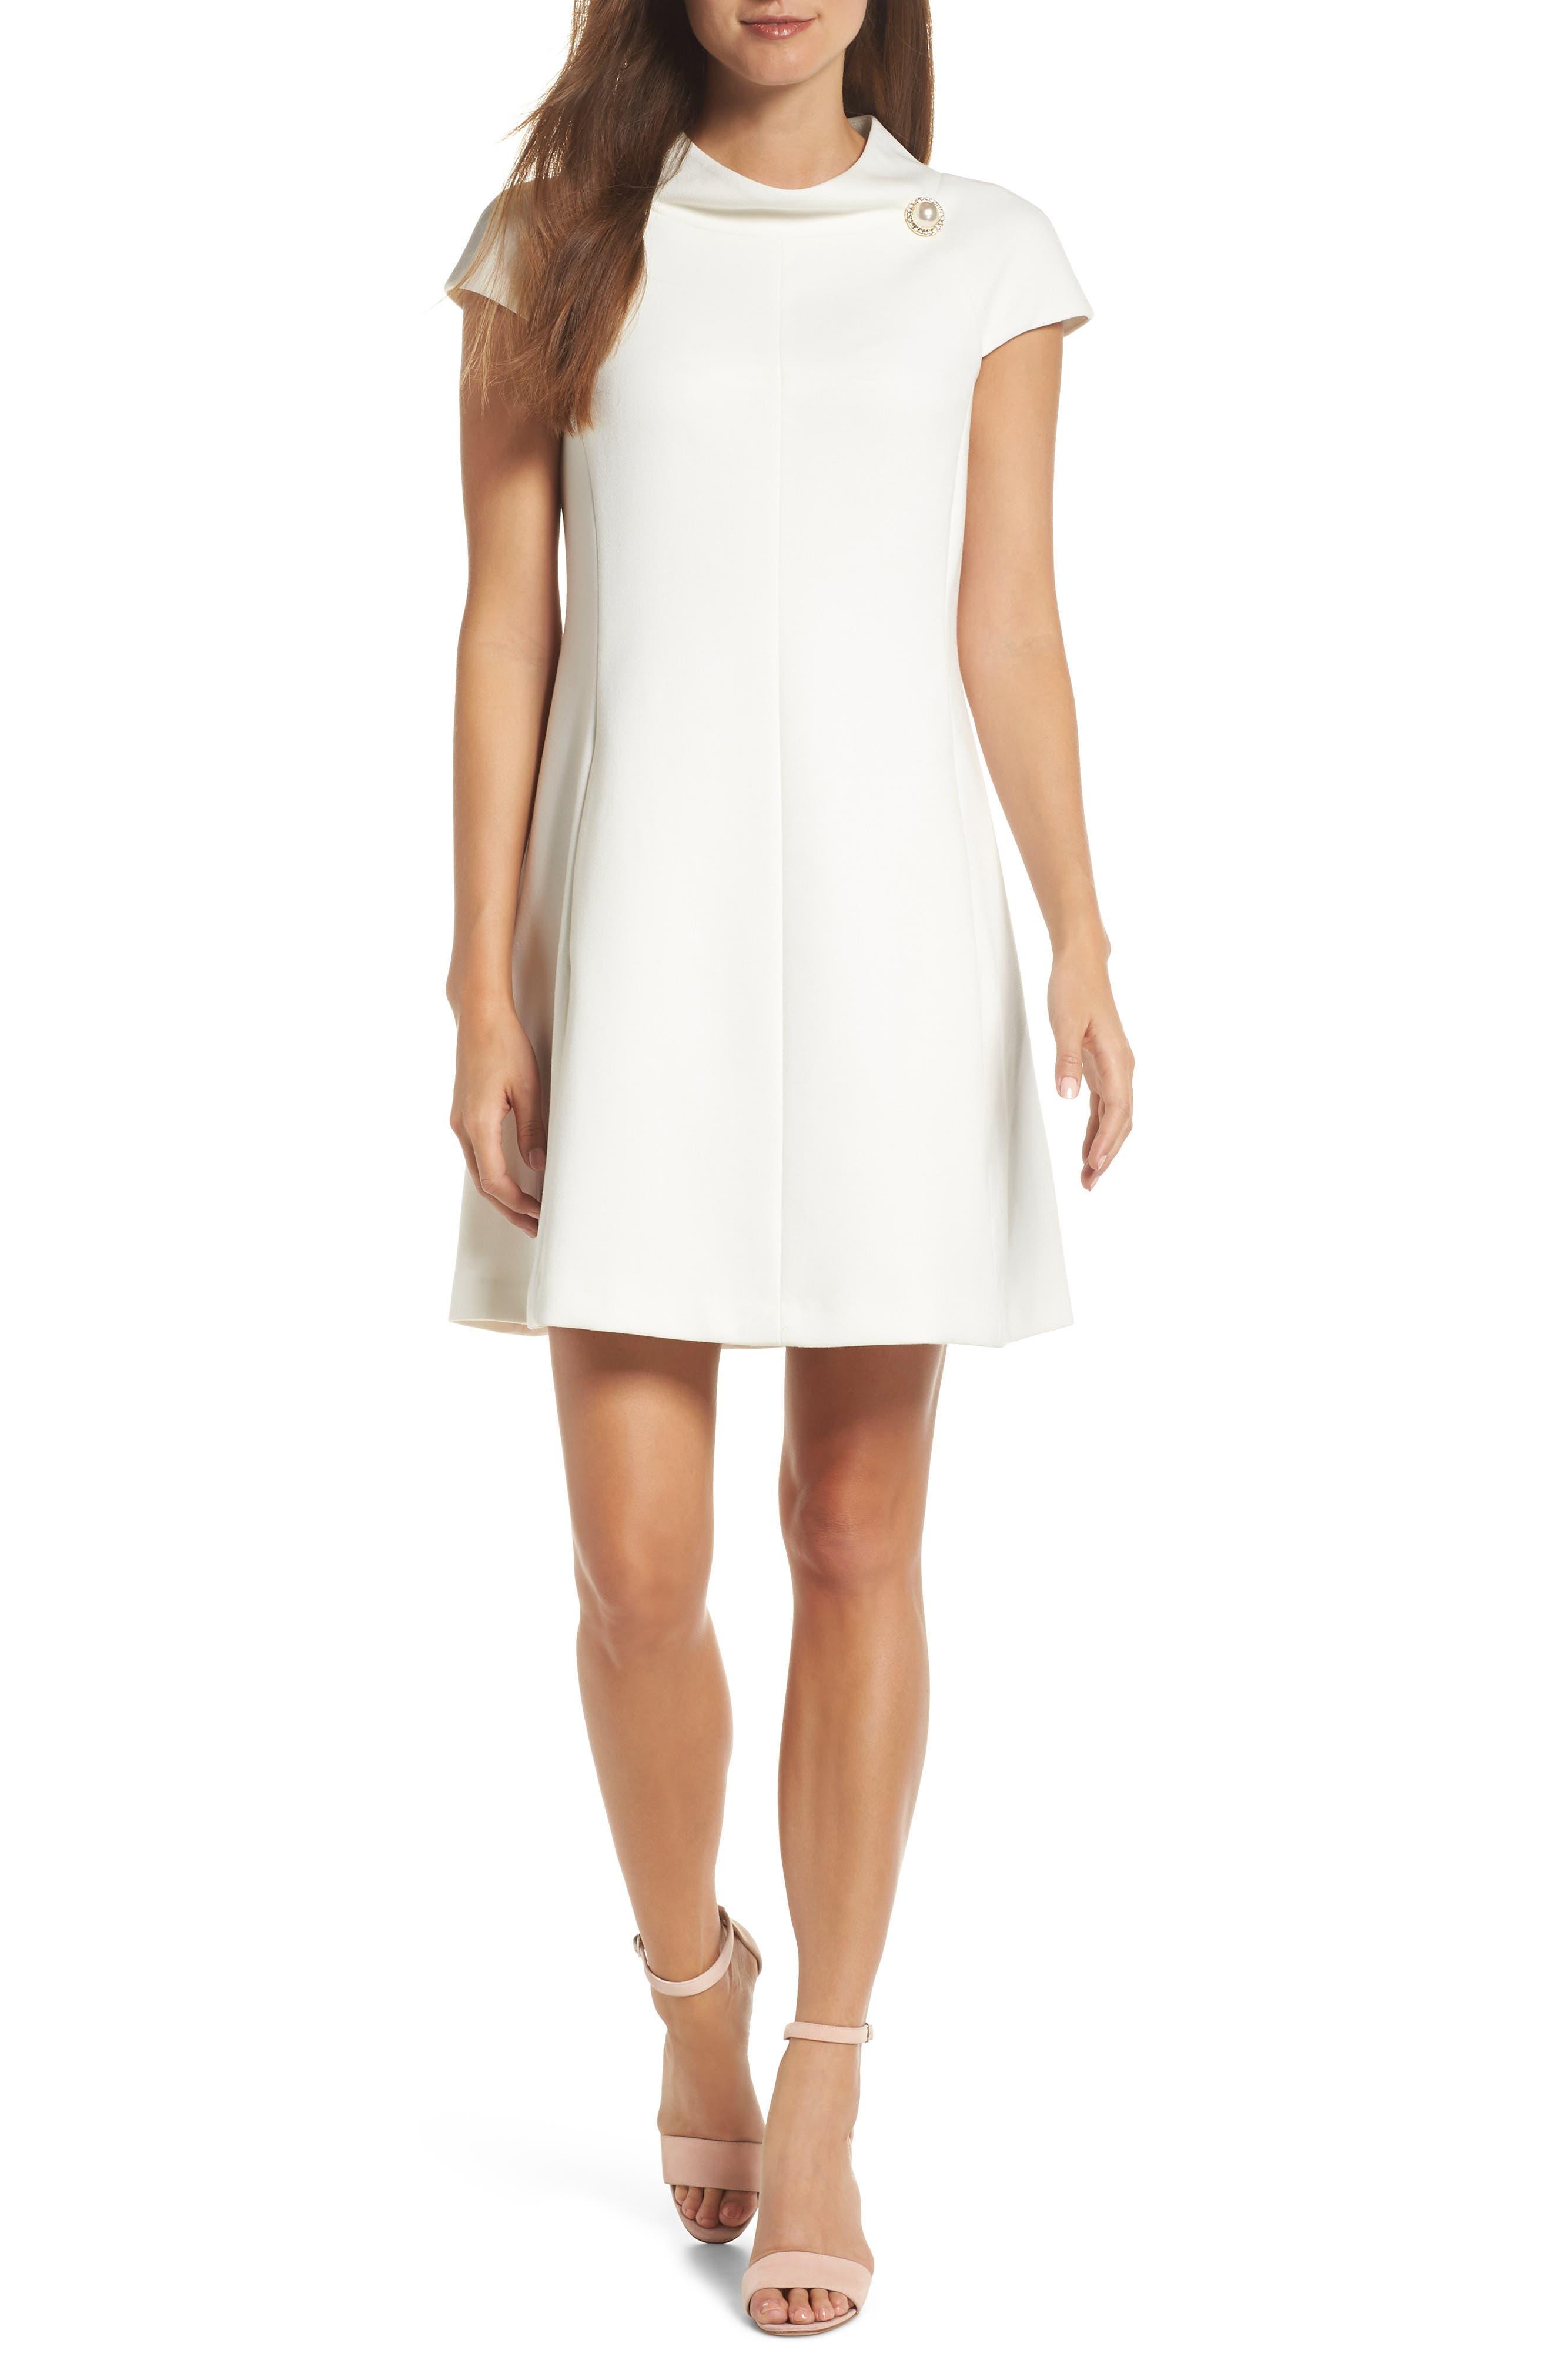 Harper Rose Stand Collar A-Line Dress